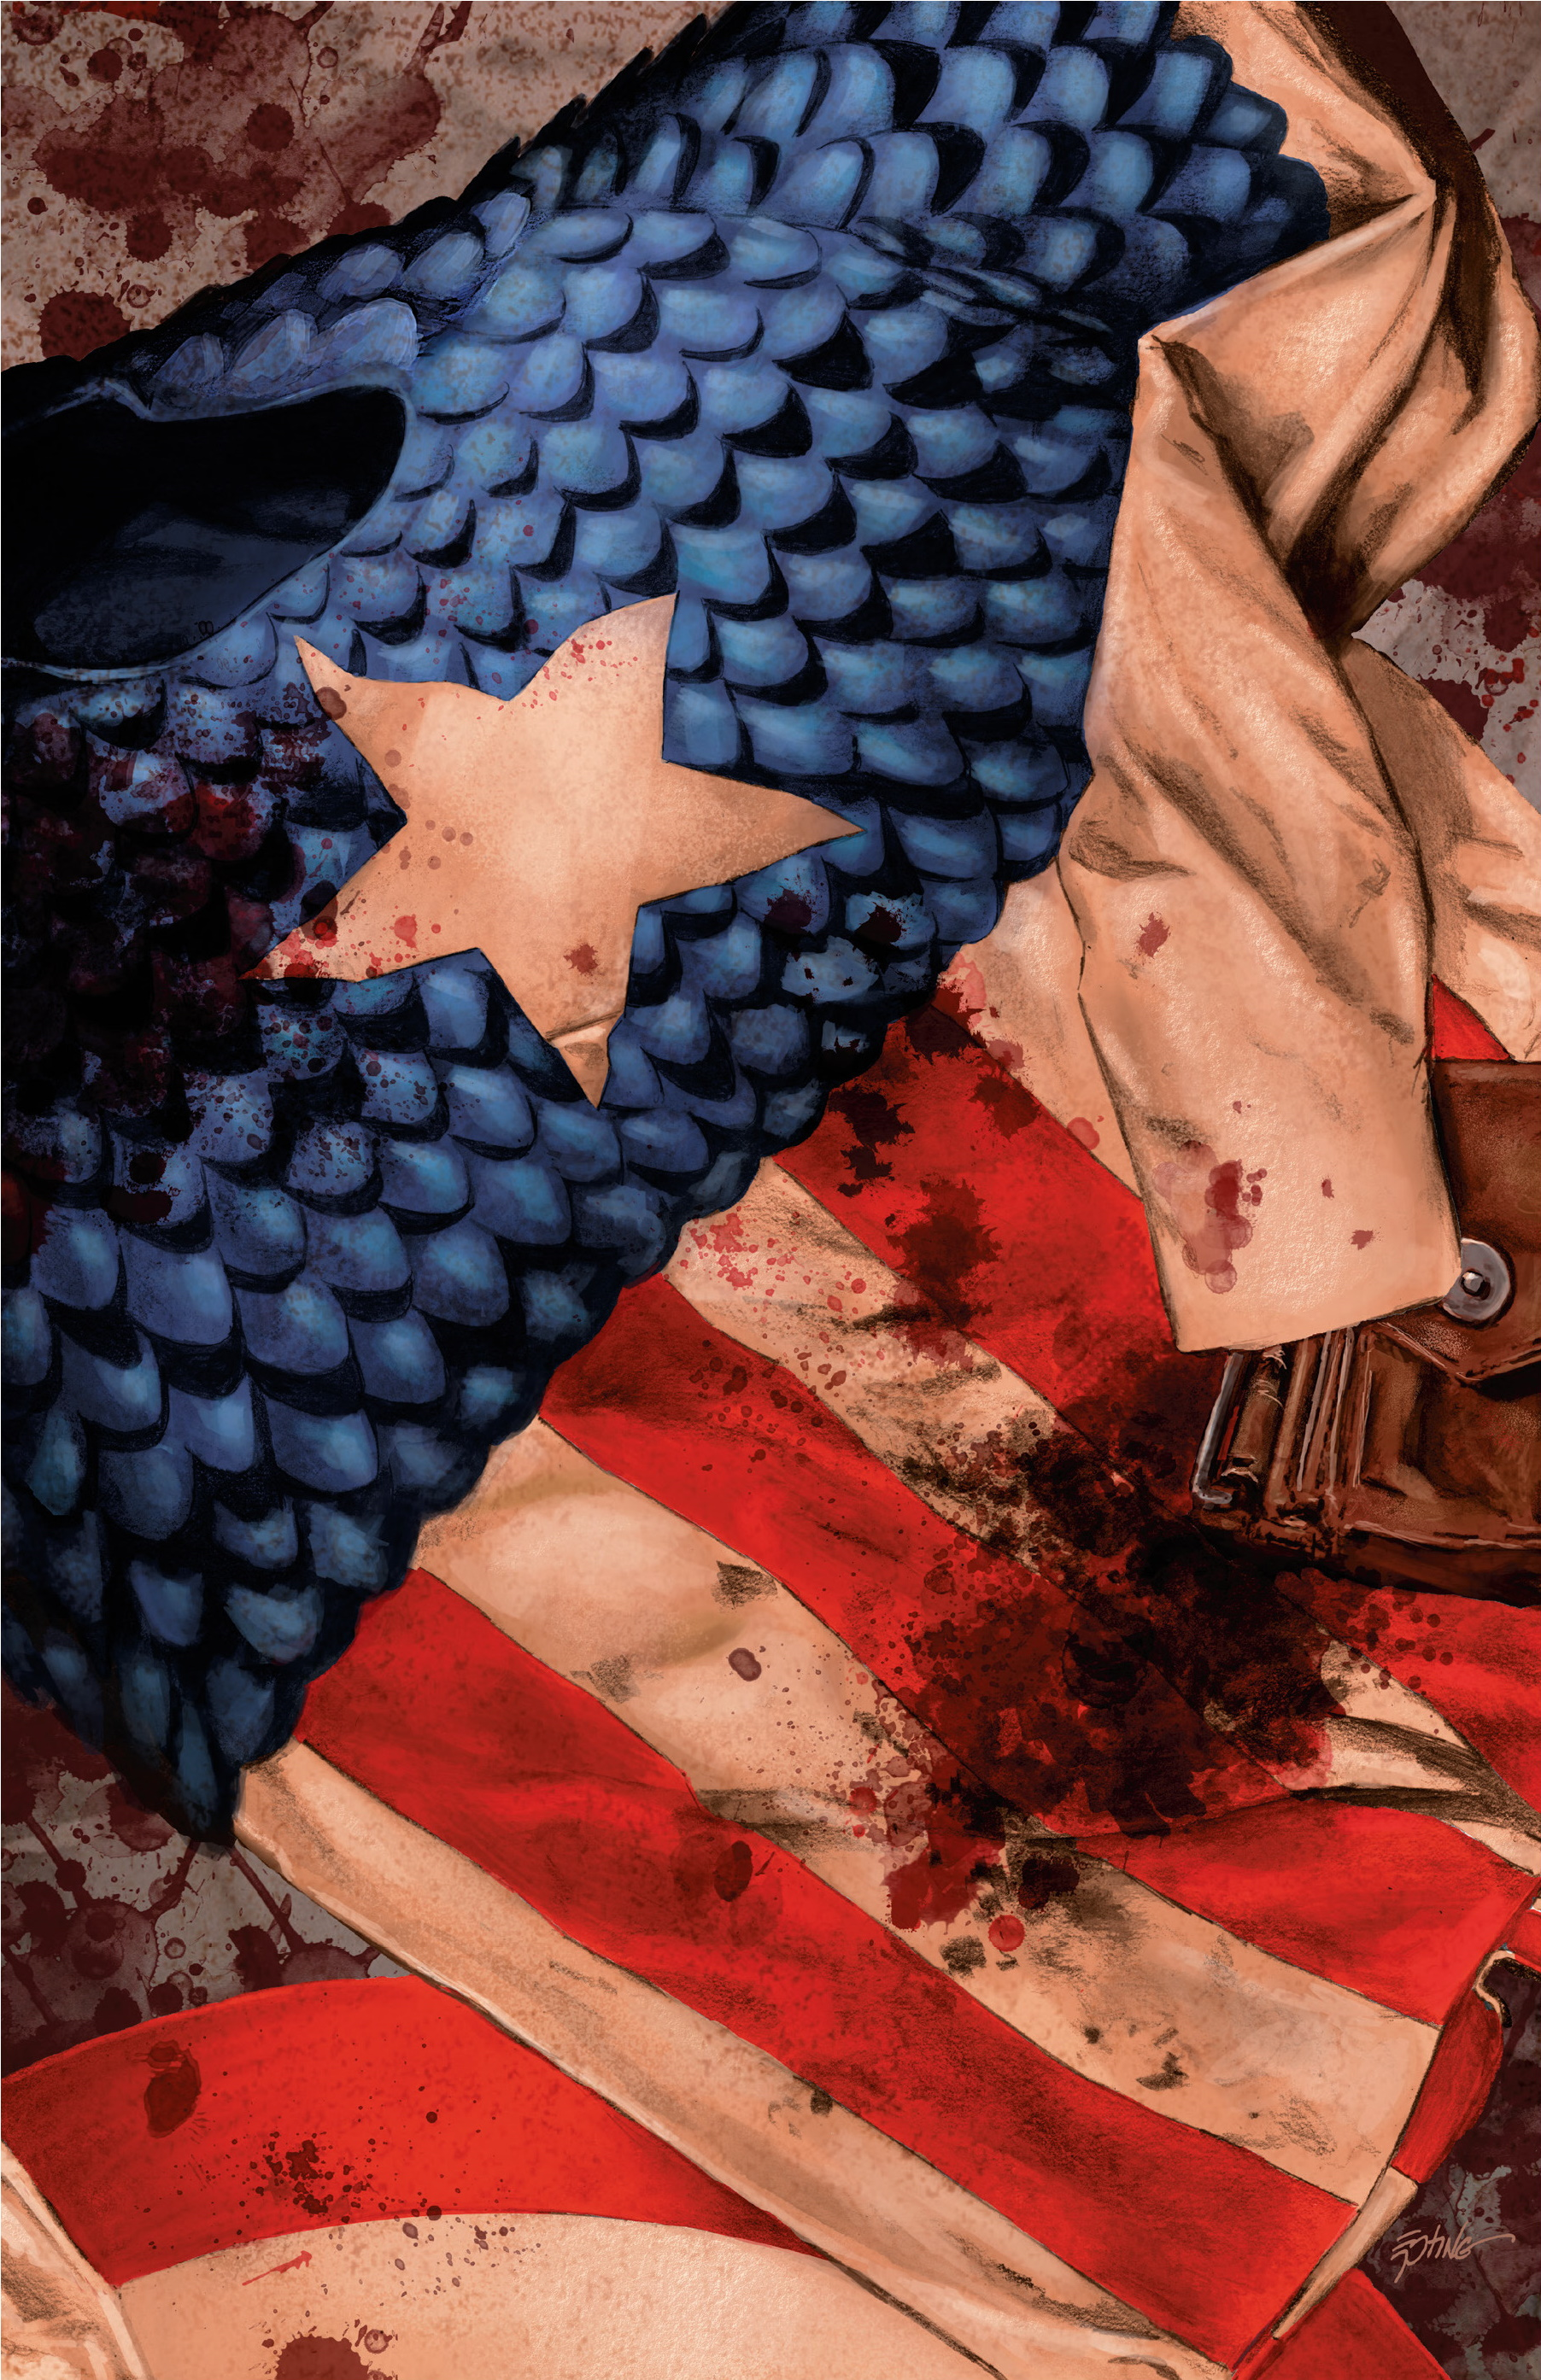 Captain America Vol 5 25 Director's Cut Textless.jpg